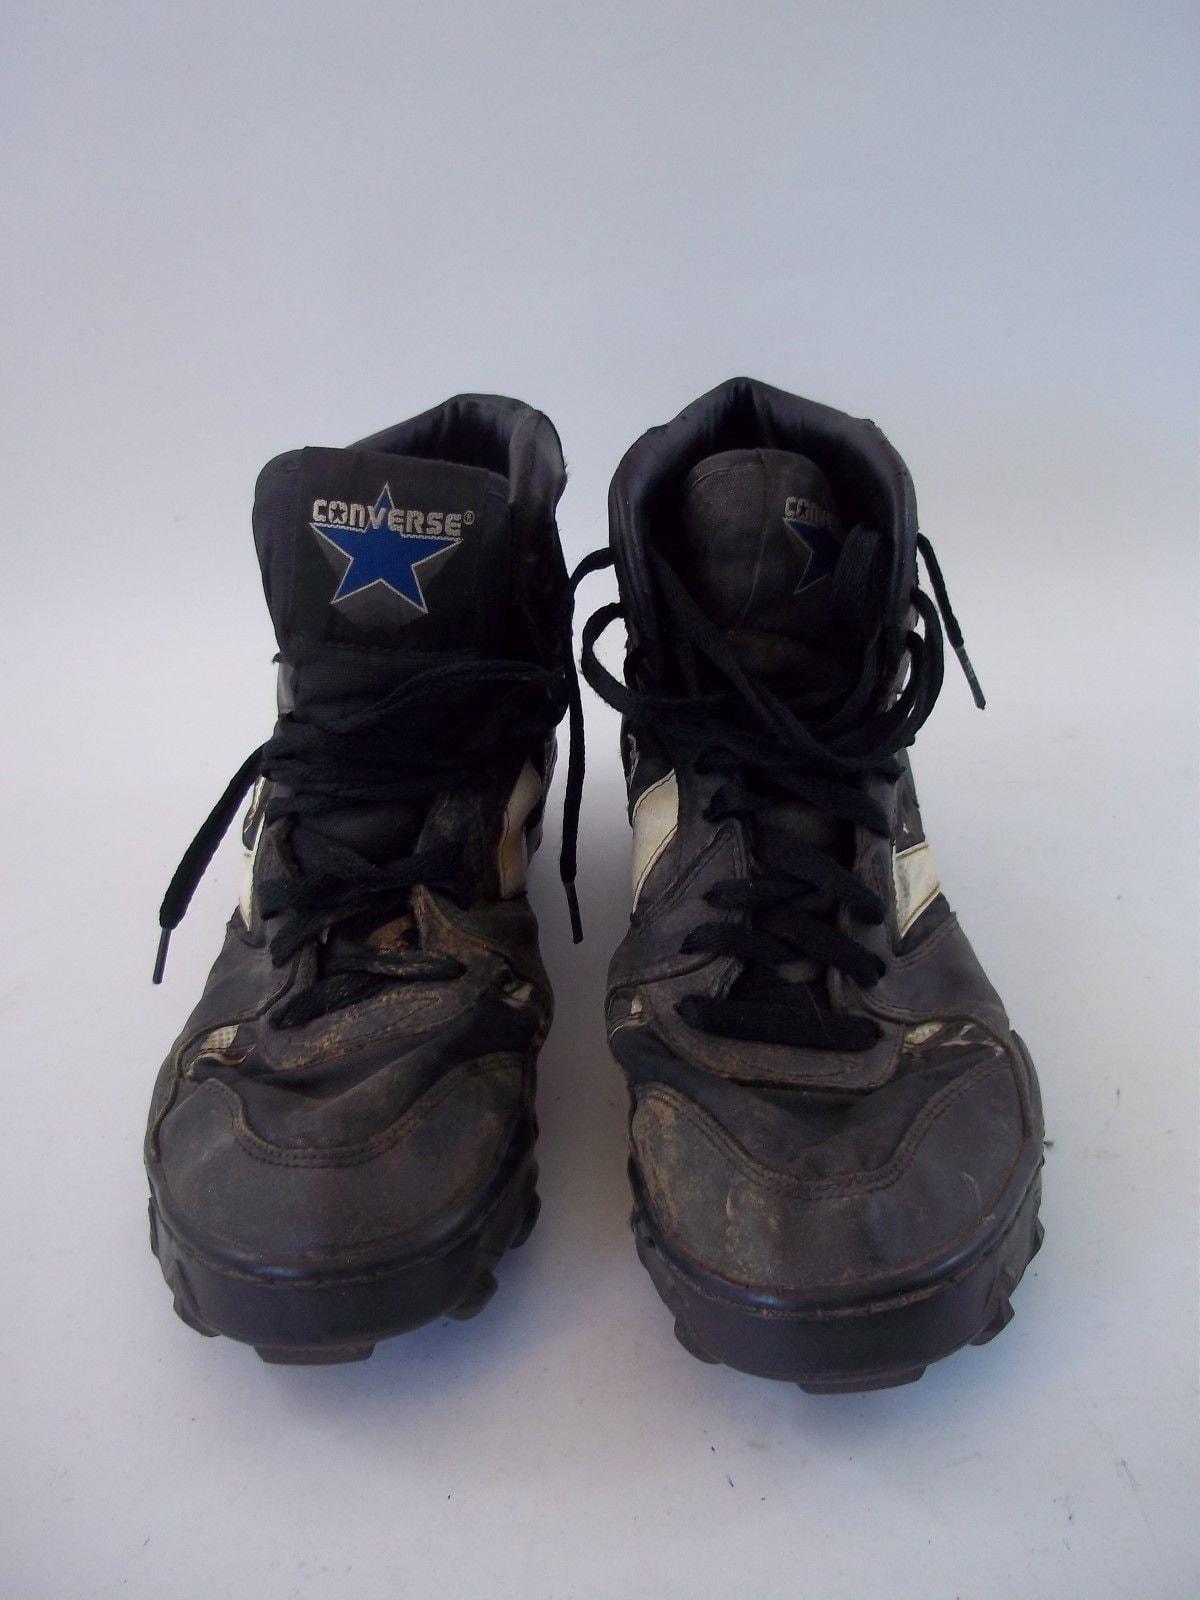 7ea28ca9bb377 Rare Vintage 1994 Converse Cons Shoes Size 9 Black 3B9405 14094 0918